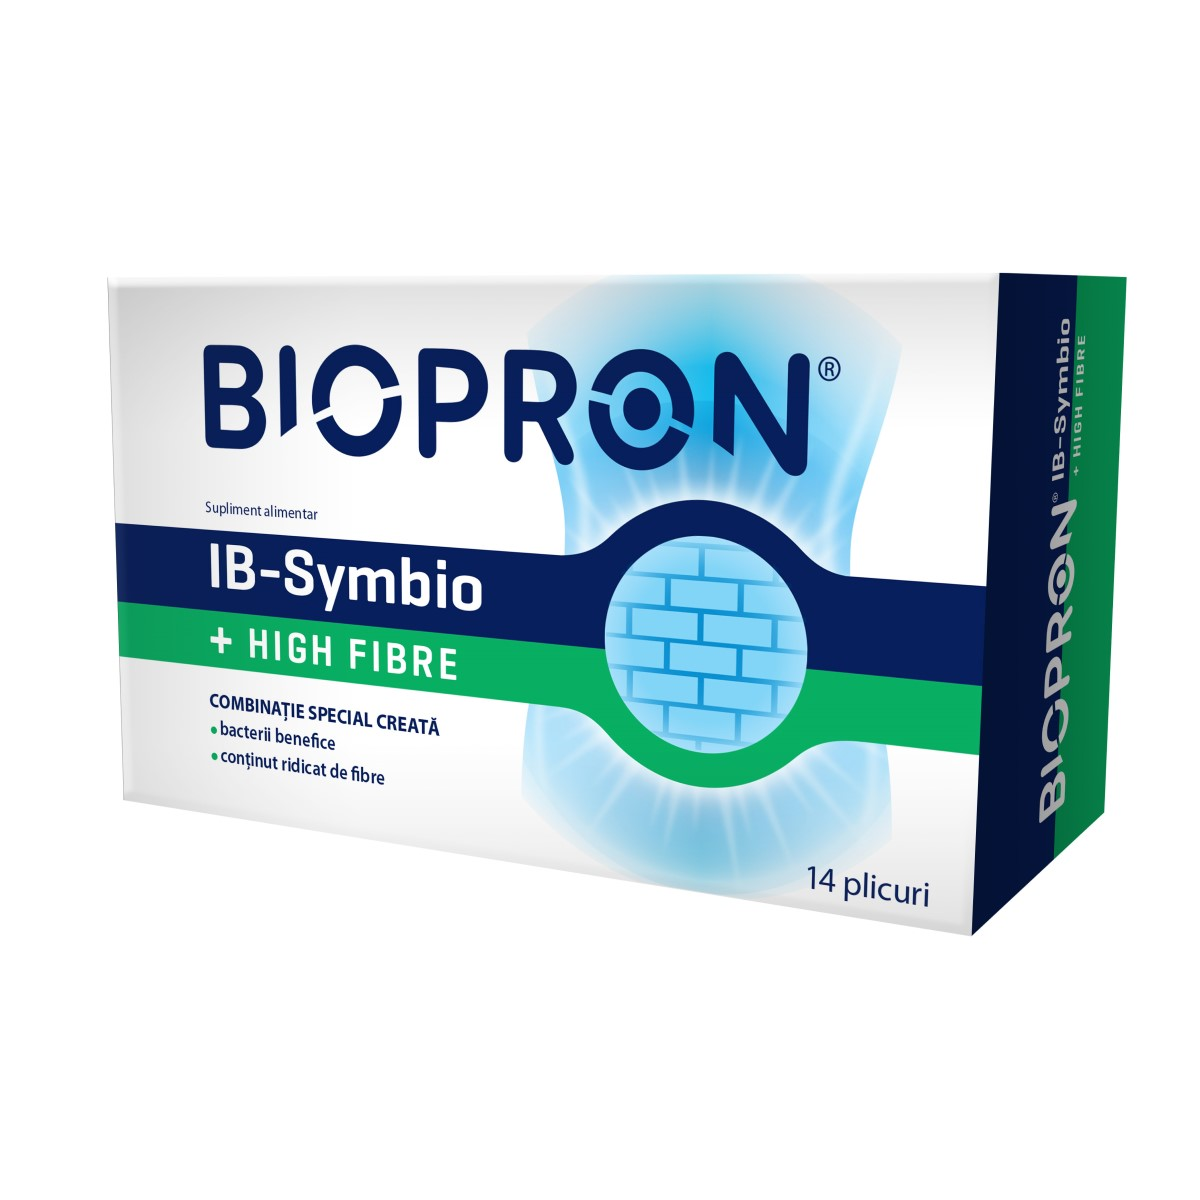 Biopron IB-Symbio + High Fibre, 14 plicuri, Walmark